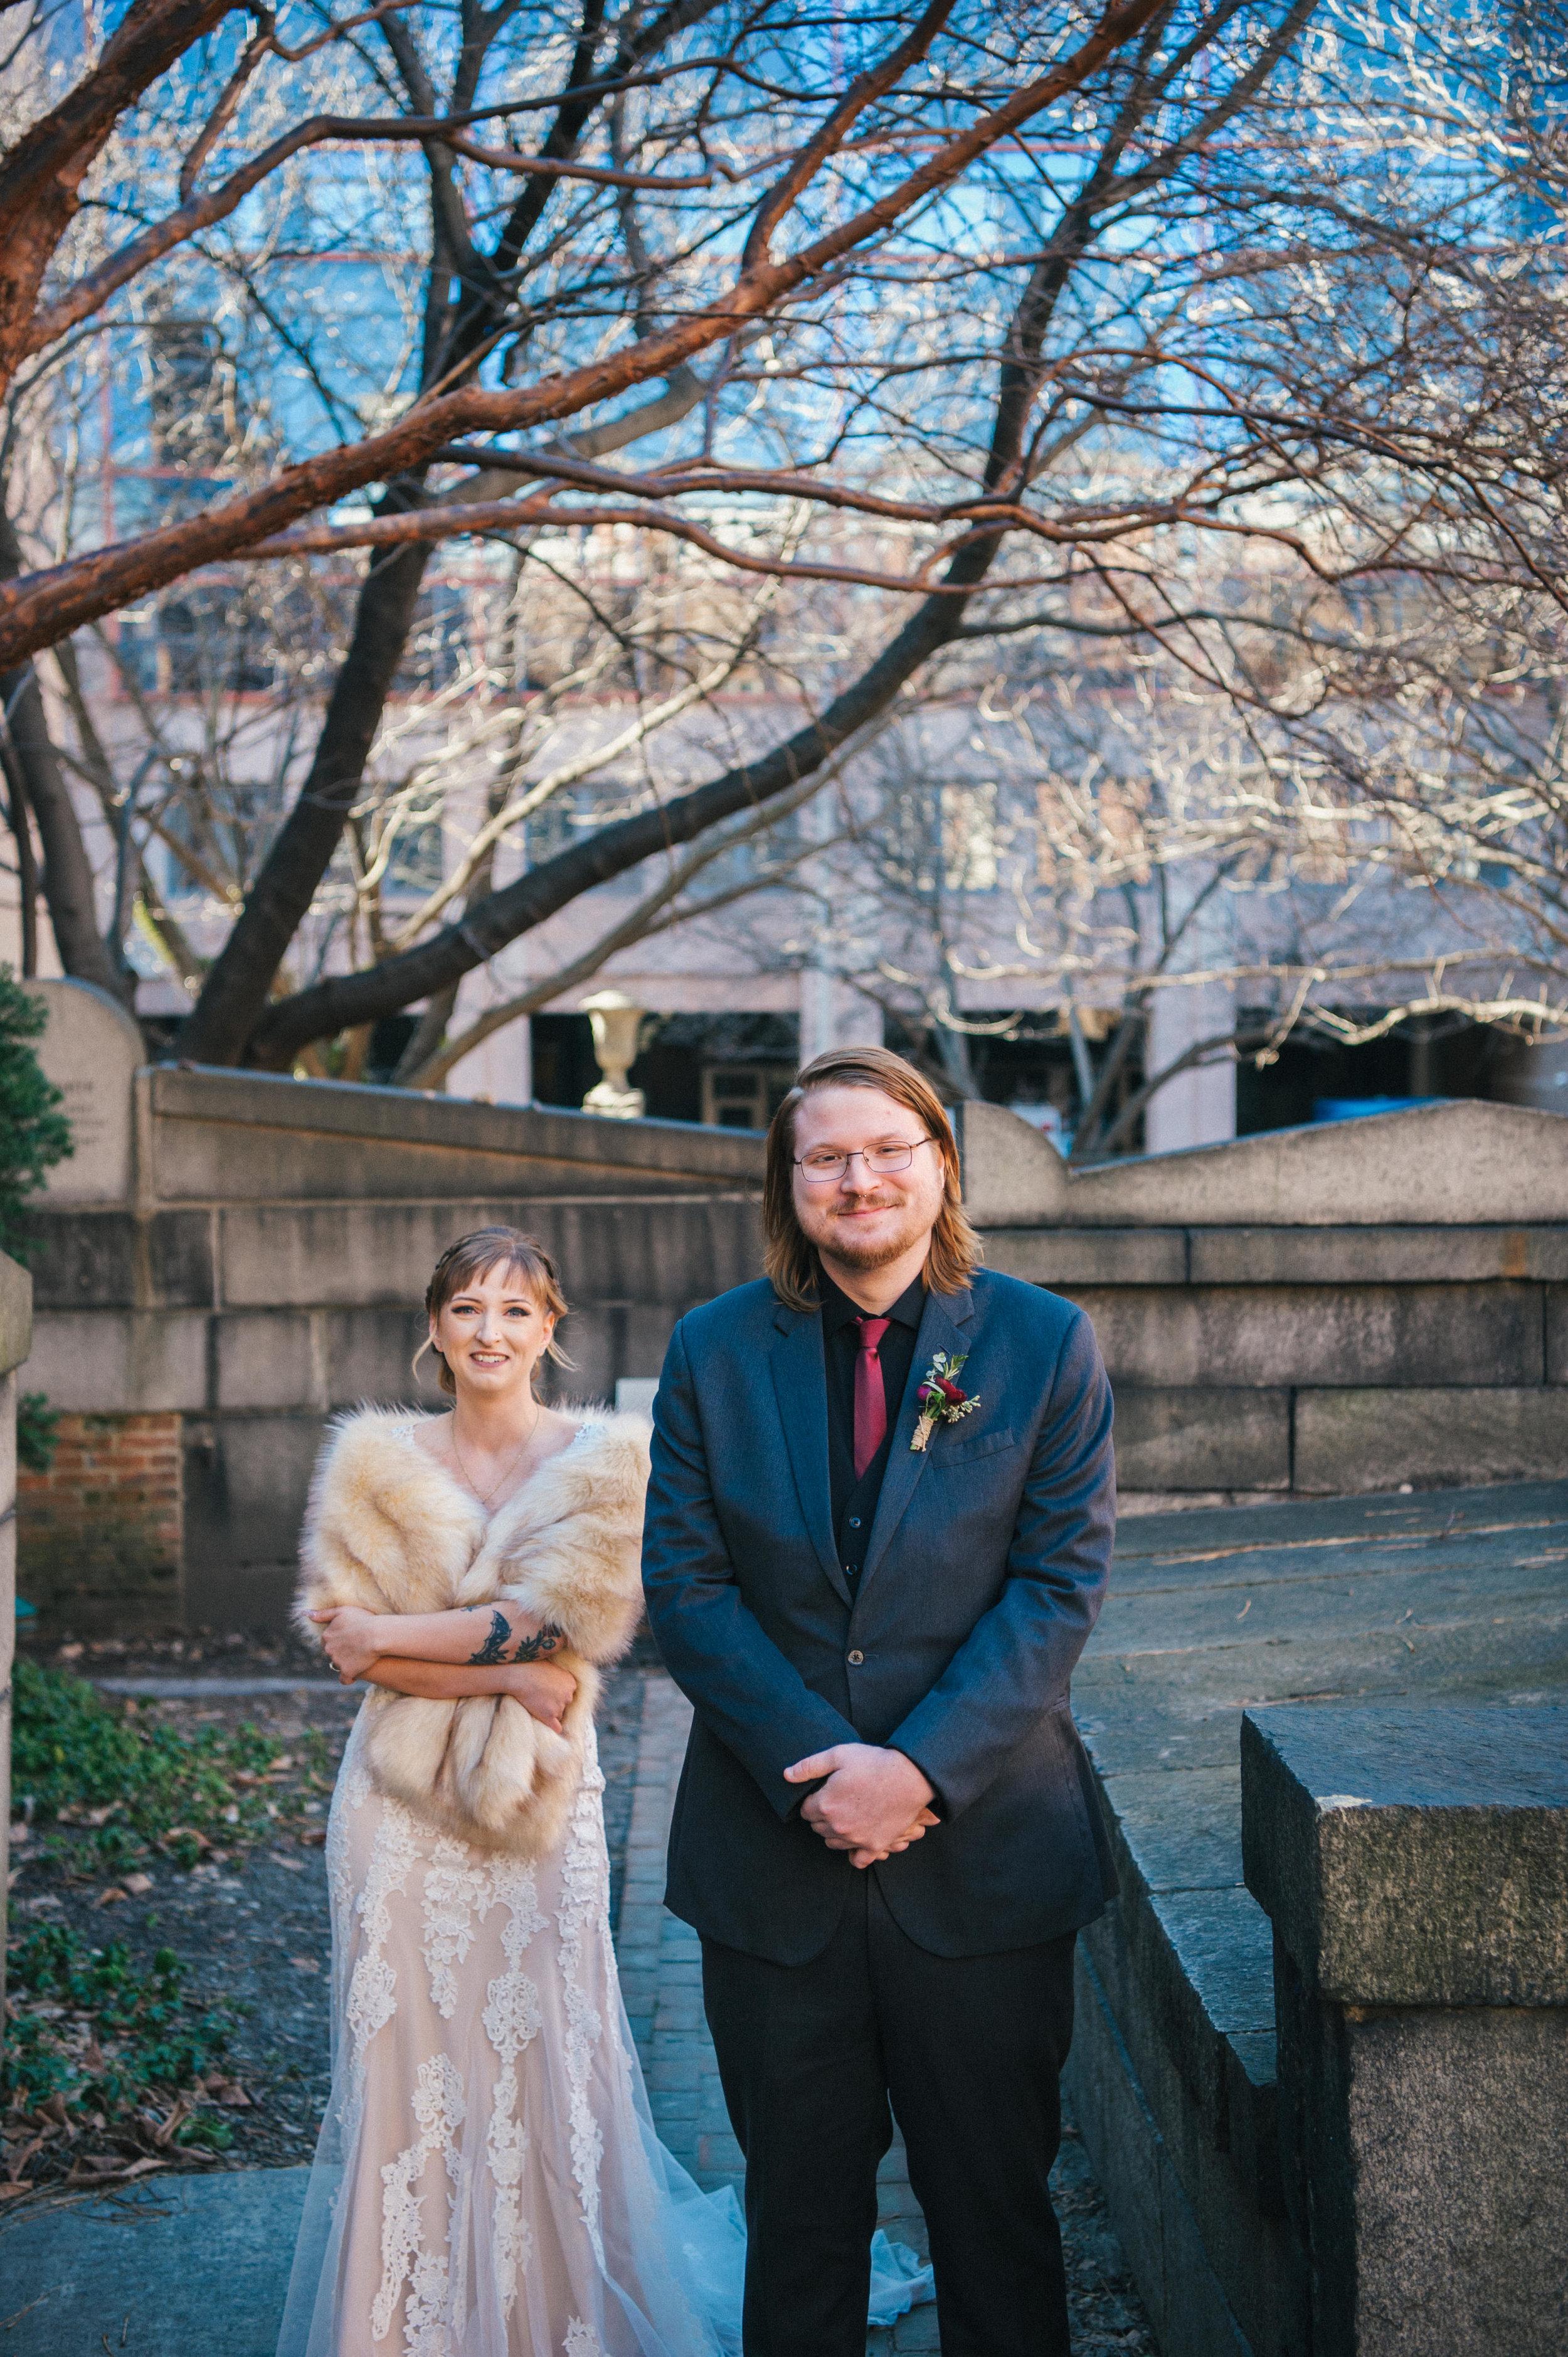 Amber and Kyles Wedding 10.jpg